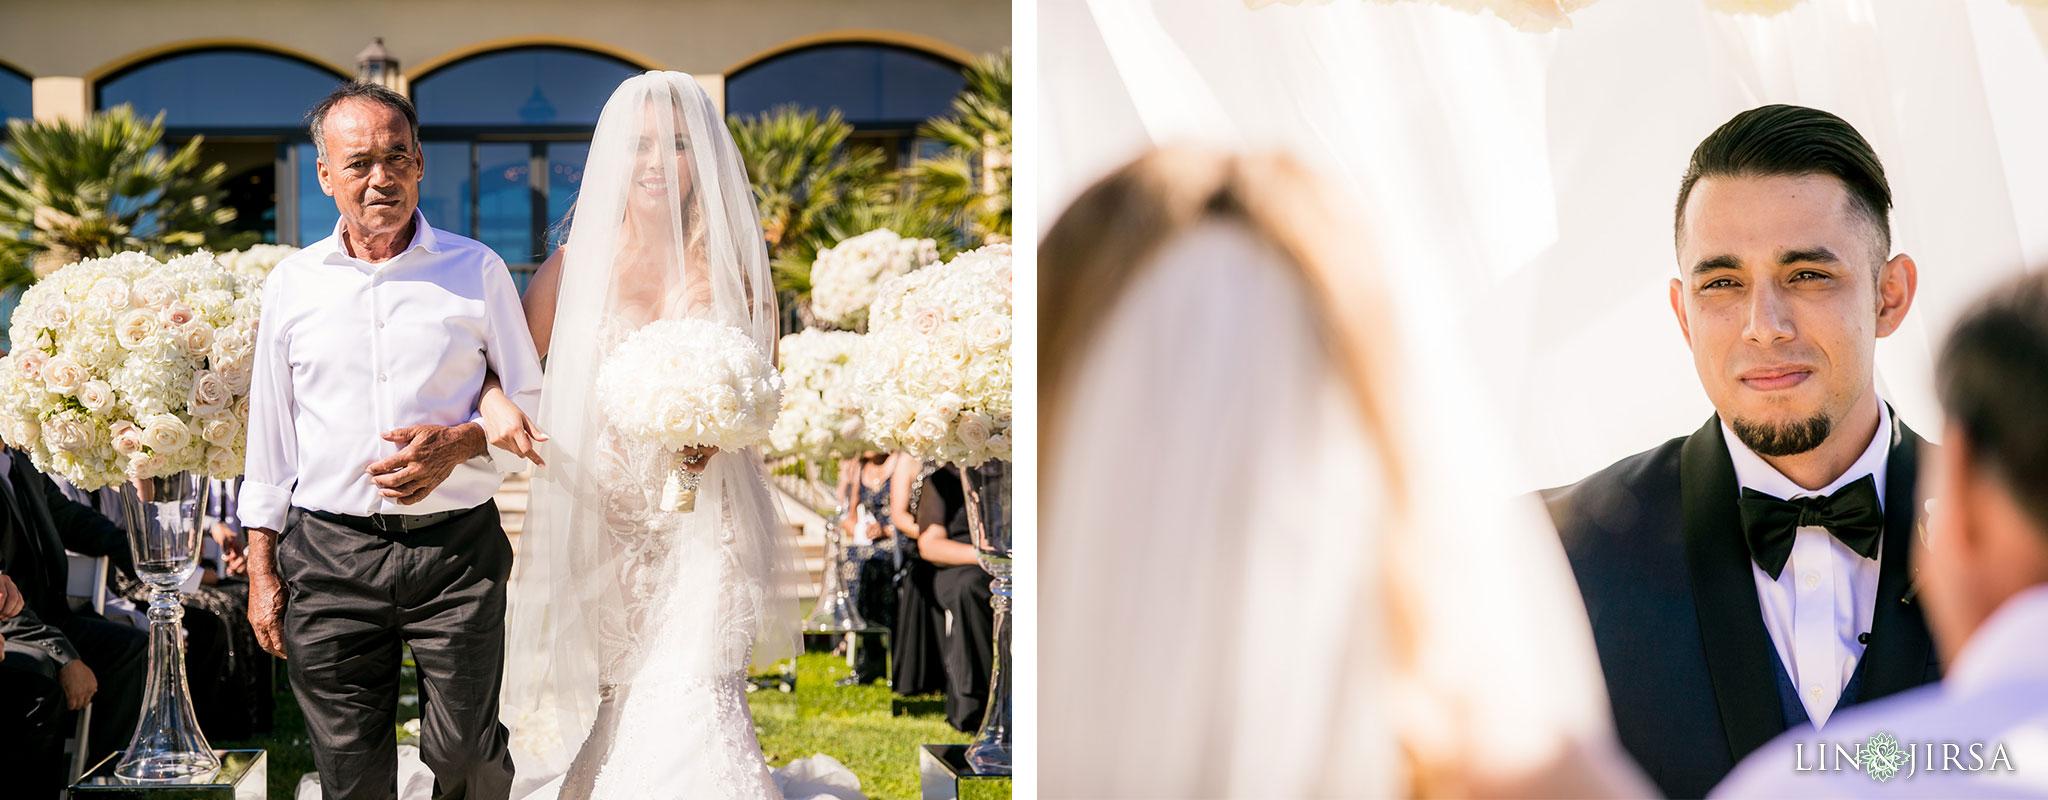 14 trump national golf club palos verdes wedding ceremony photography